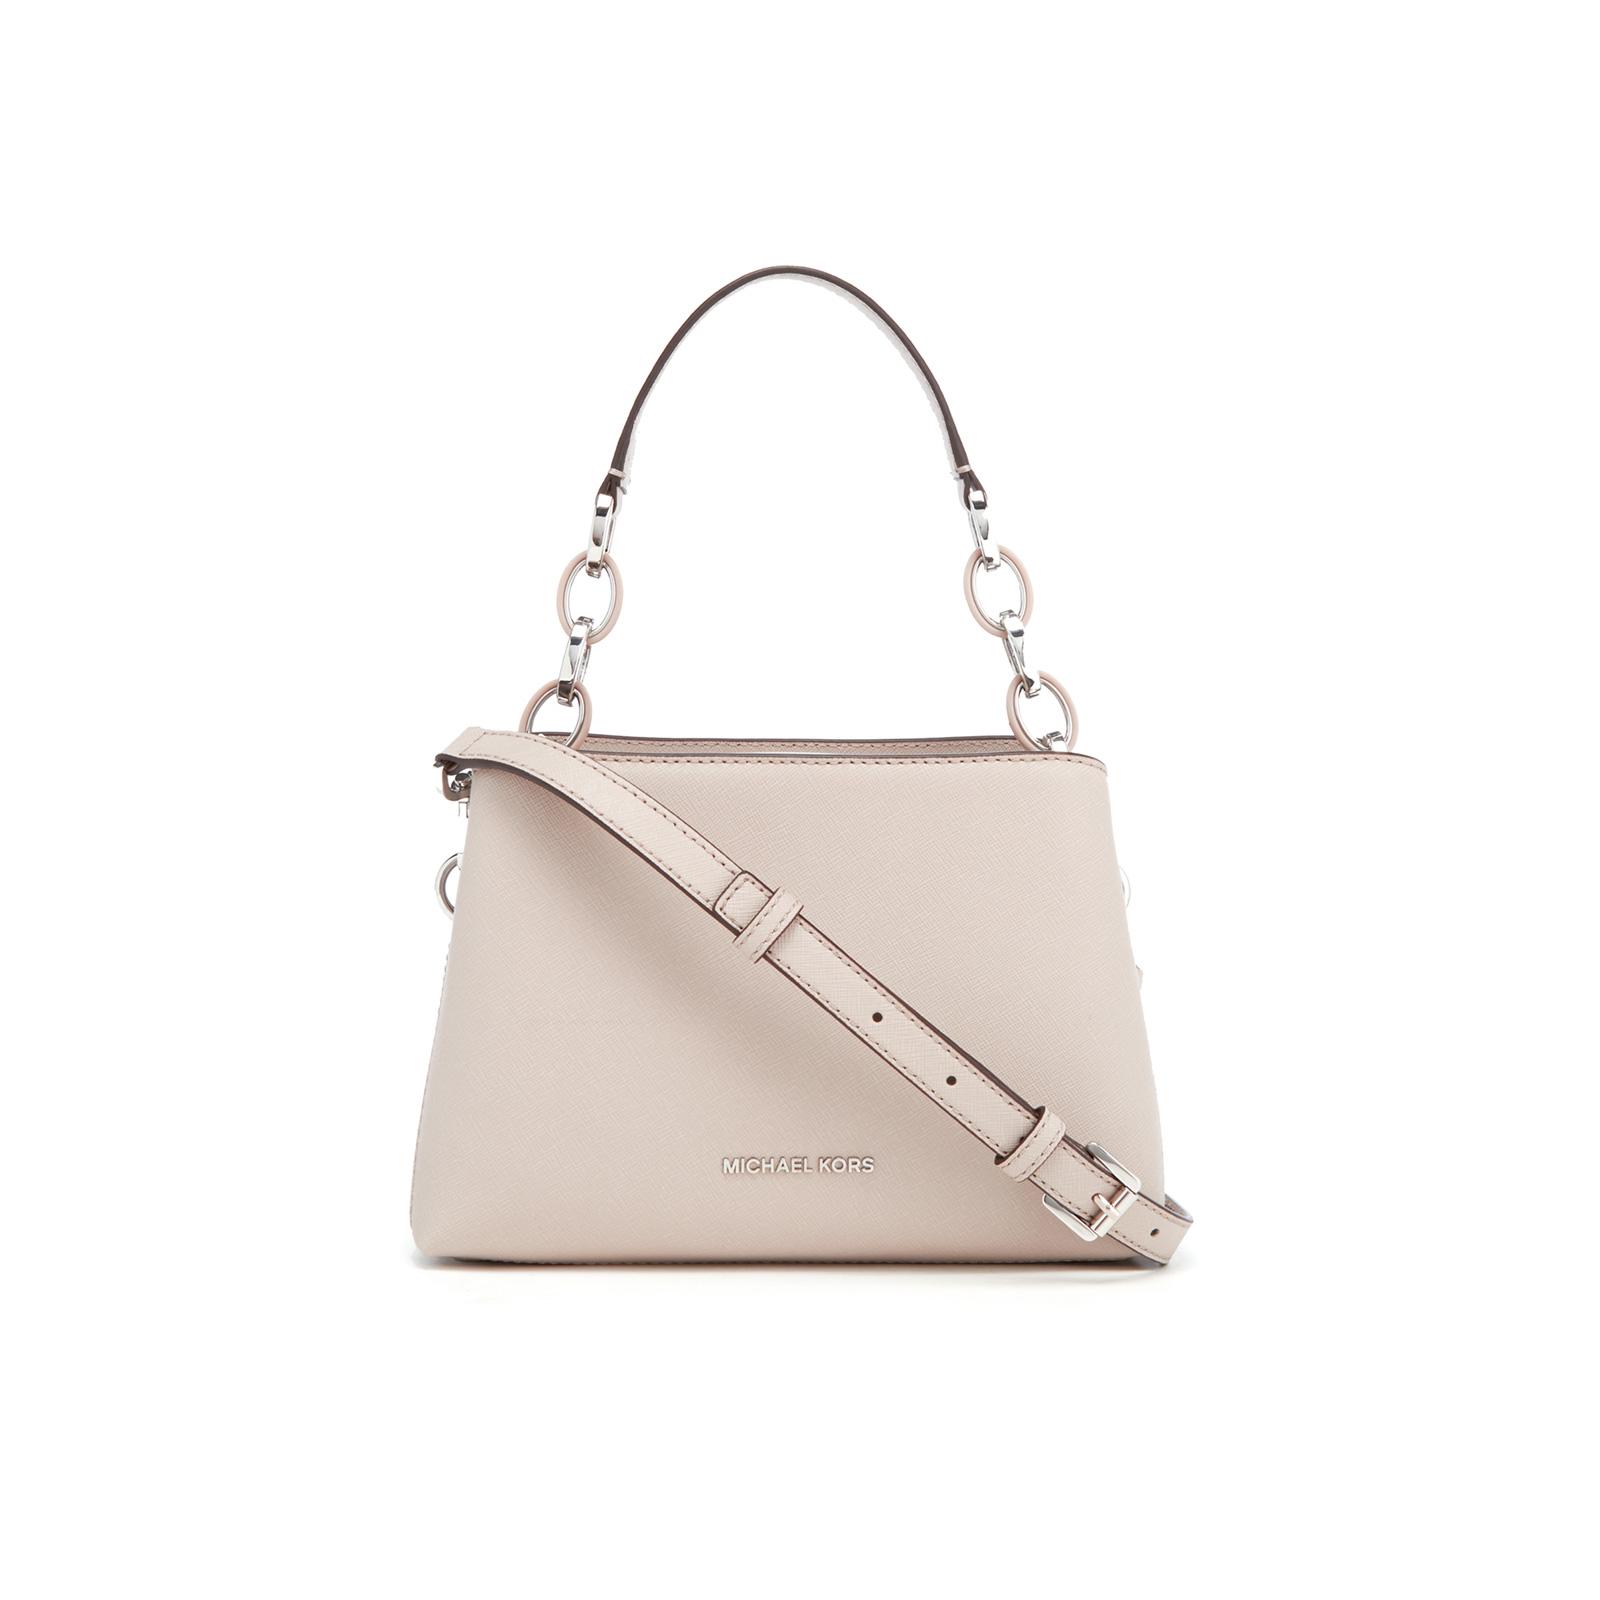 5883e6b7223279 MICHAEL MICHAEL KORS Women's Portia Small Shoulder Bag - Cement - Free UK  Delivery over £50